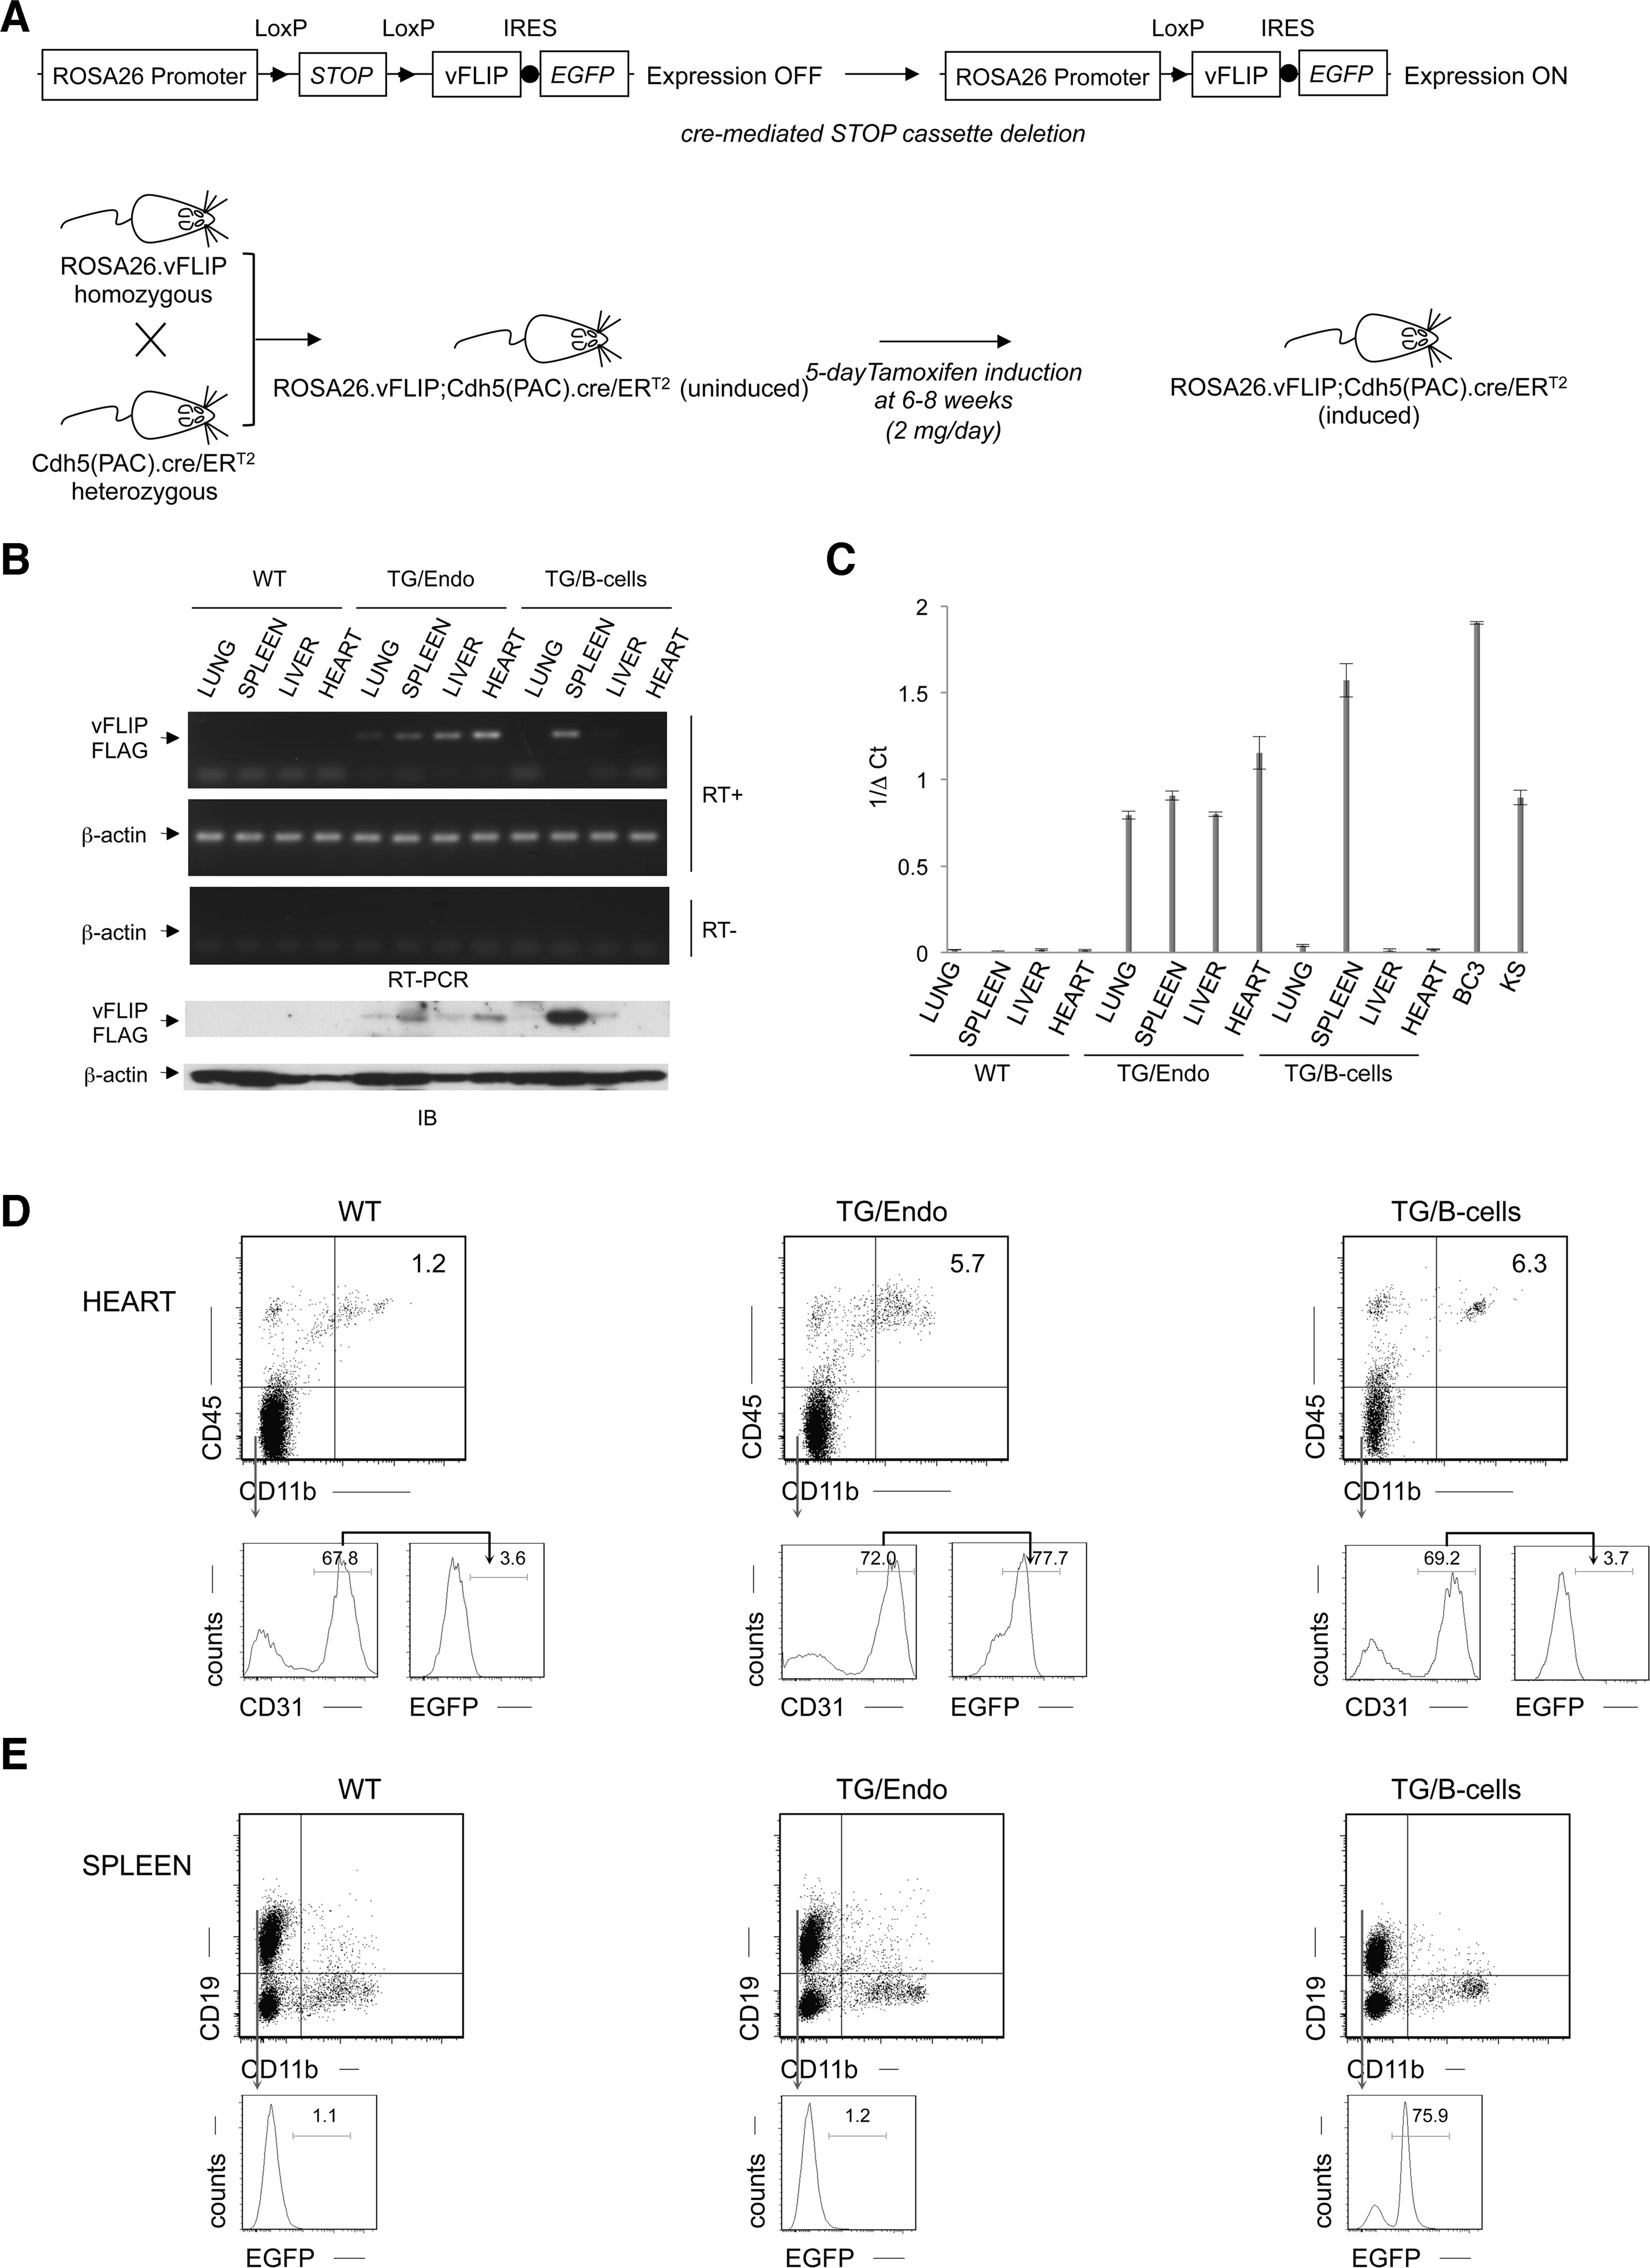 Generation of ROSA26.vFLIP;Cdh5(PAC).creER<sup>T2</sup> mice.